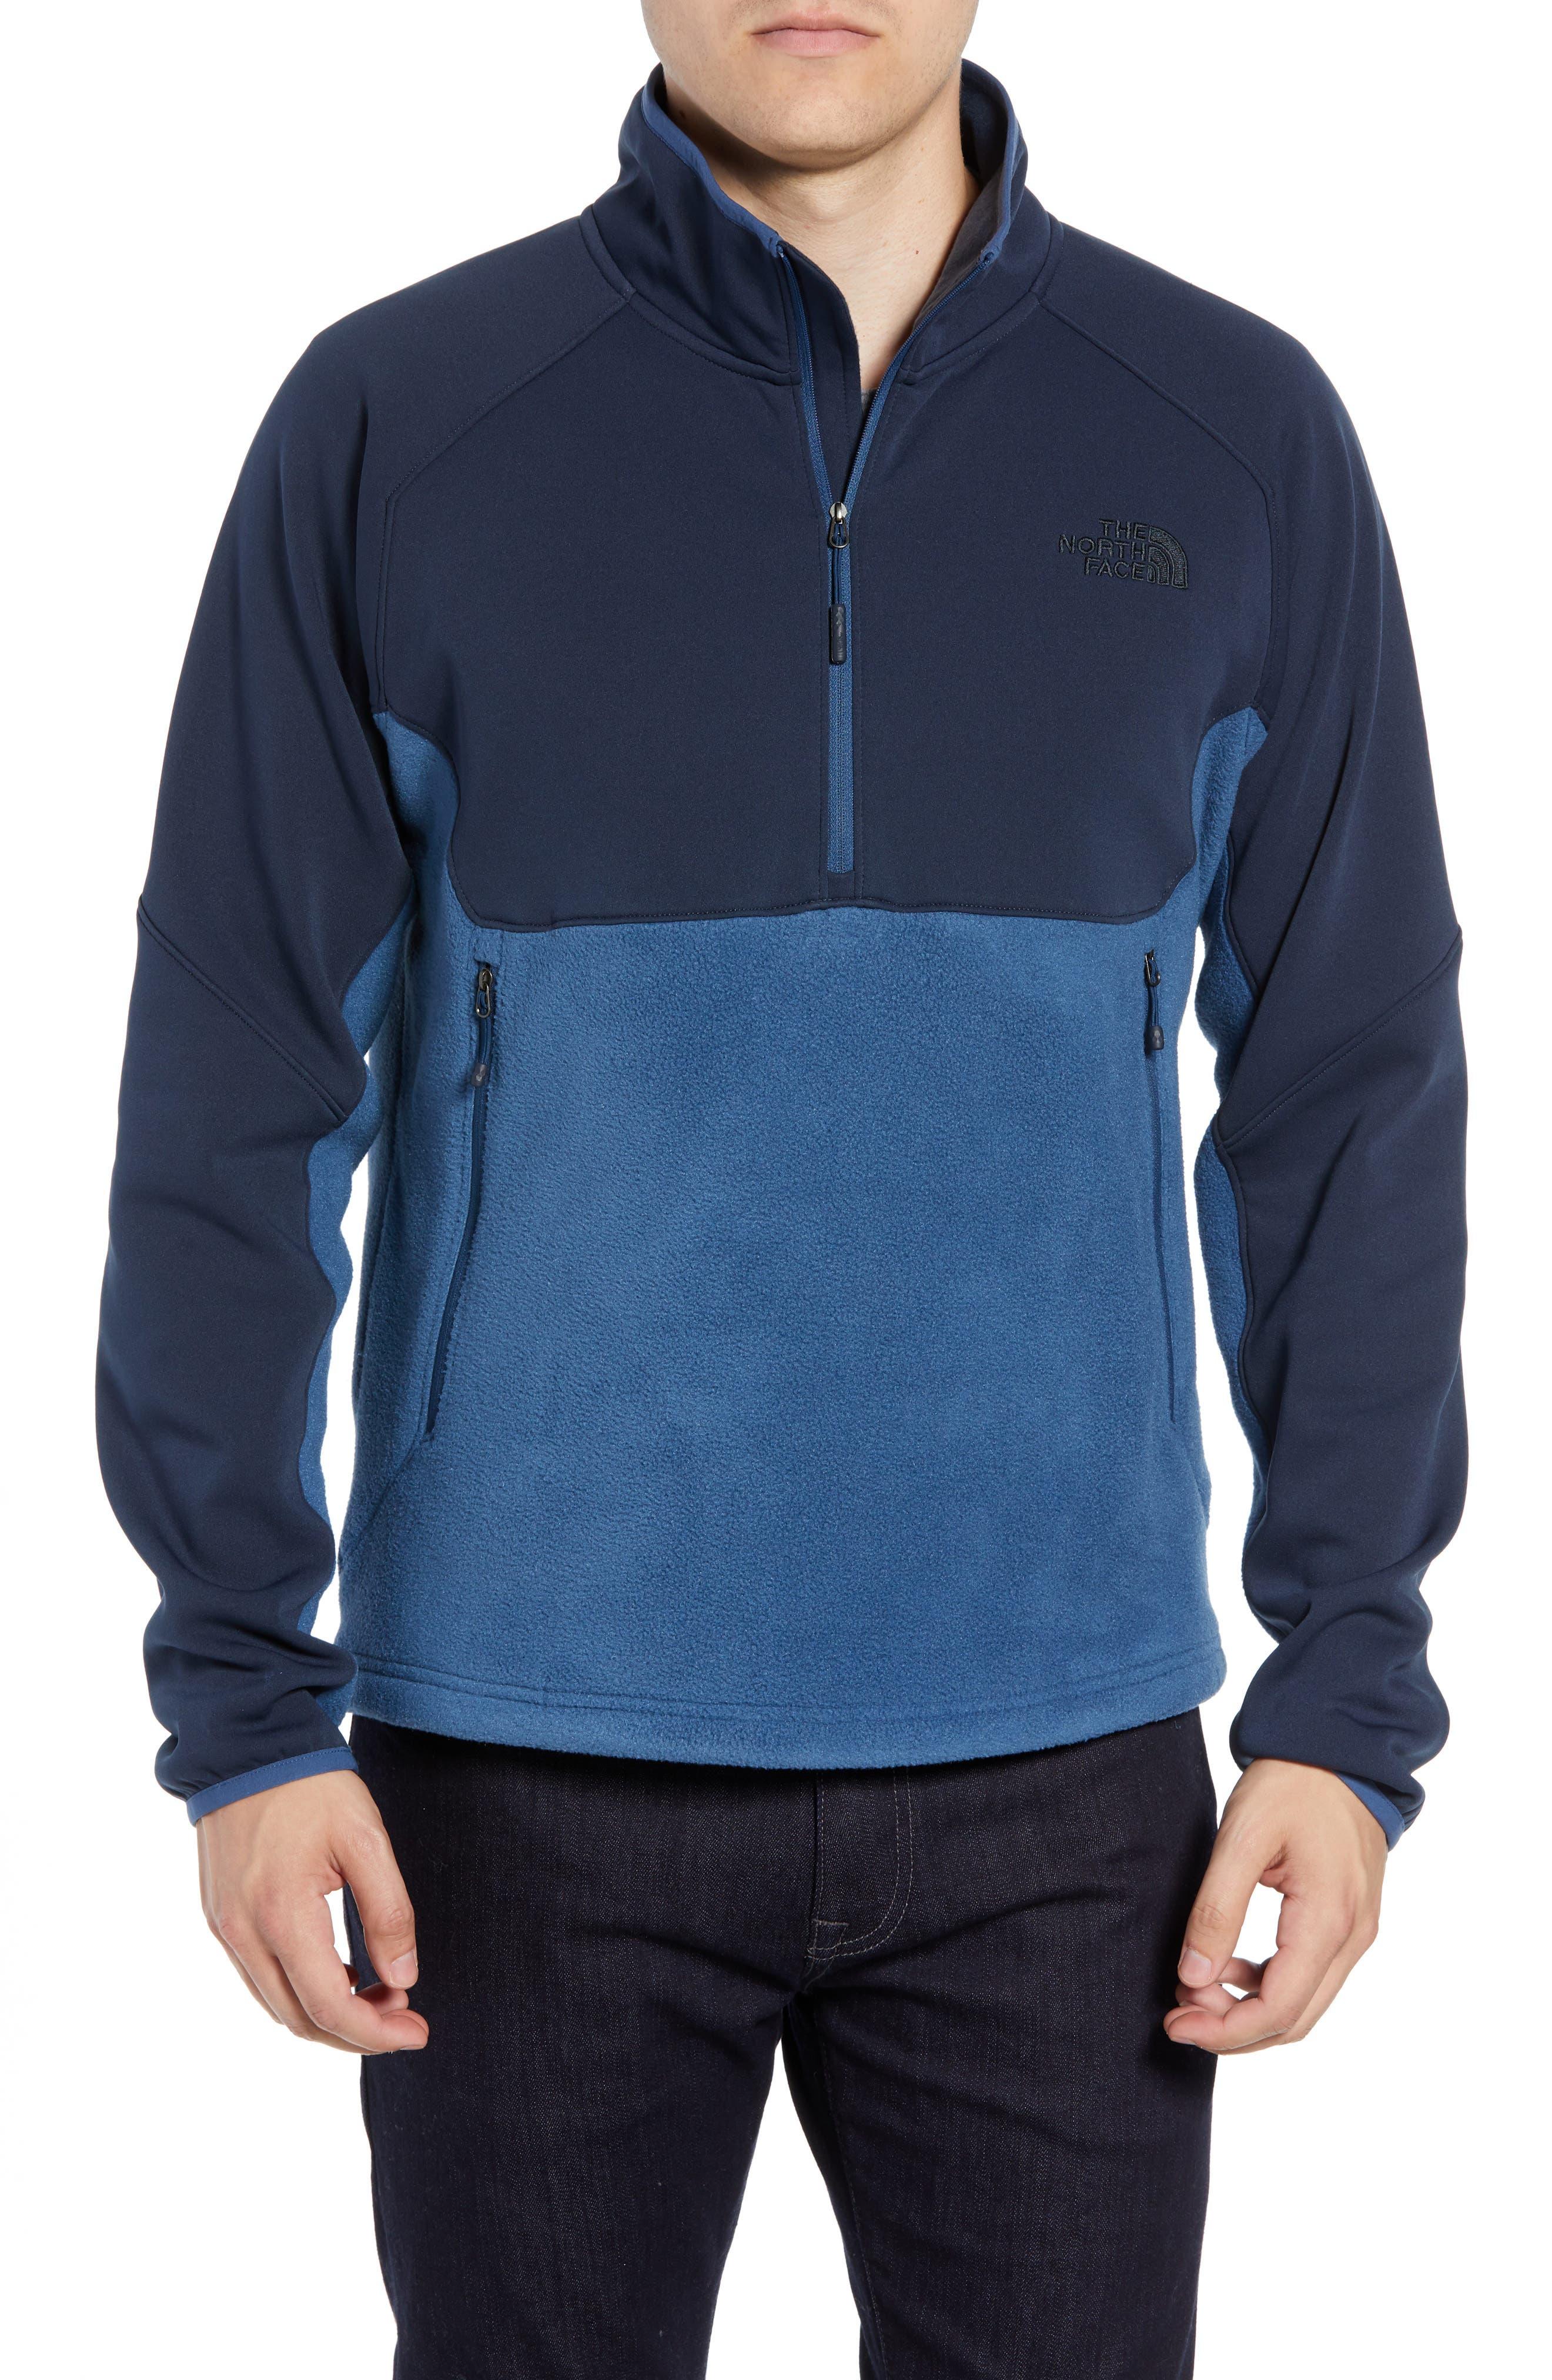 Tolmiepeak Hybrid Half-Zip Pullover,                             Main thumbnail 1, color,                             SHADY BLUE/ URBAN NAVY